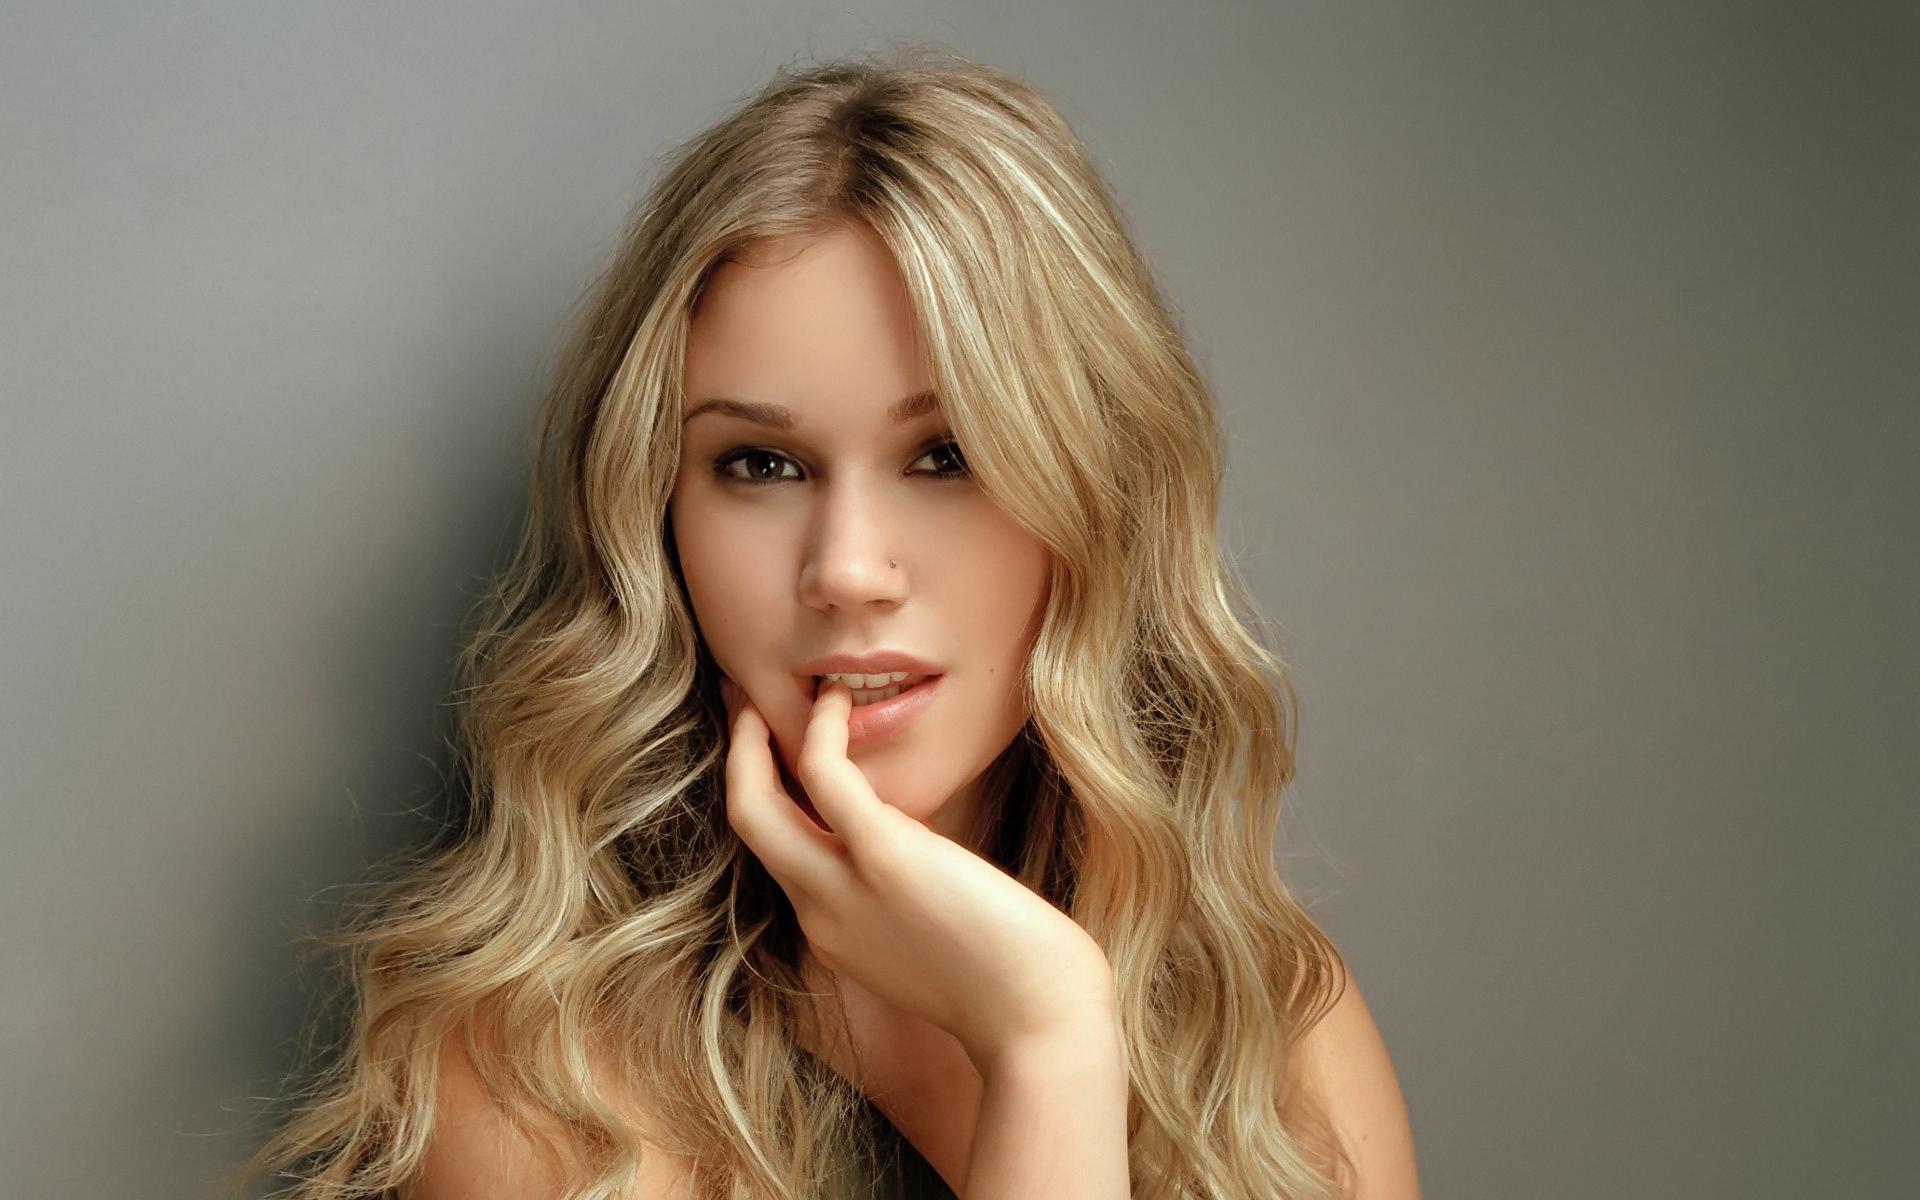 Wallpaper Face Blonde Long Hair Actress Fashion Skin Head